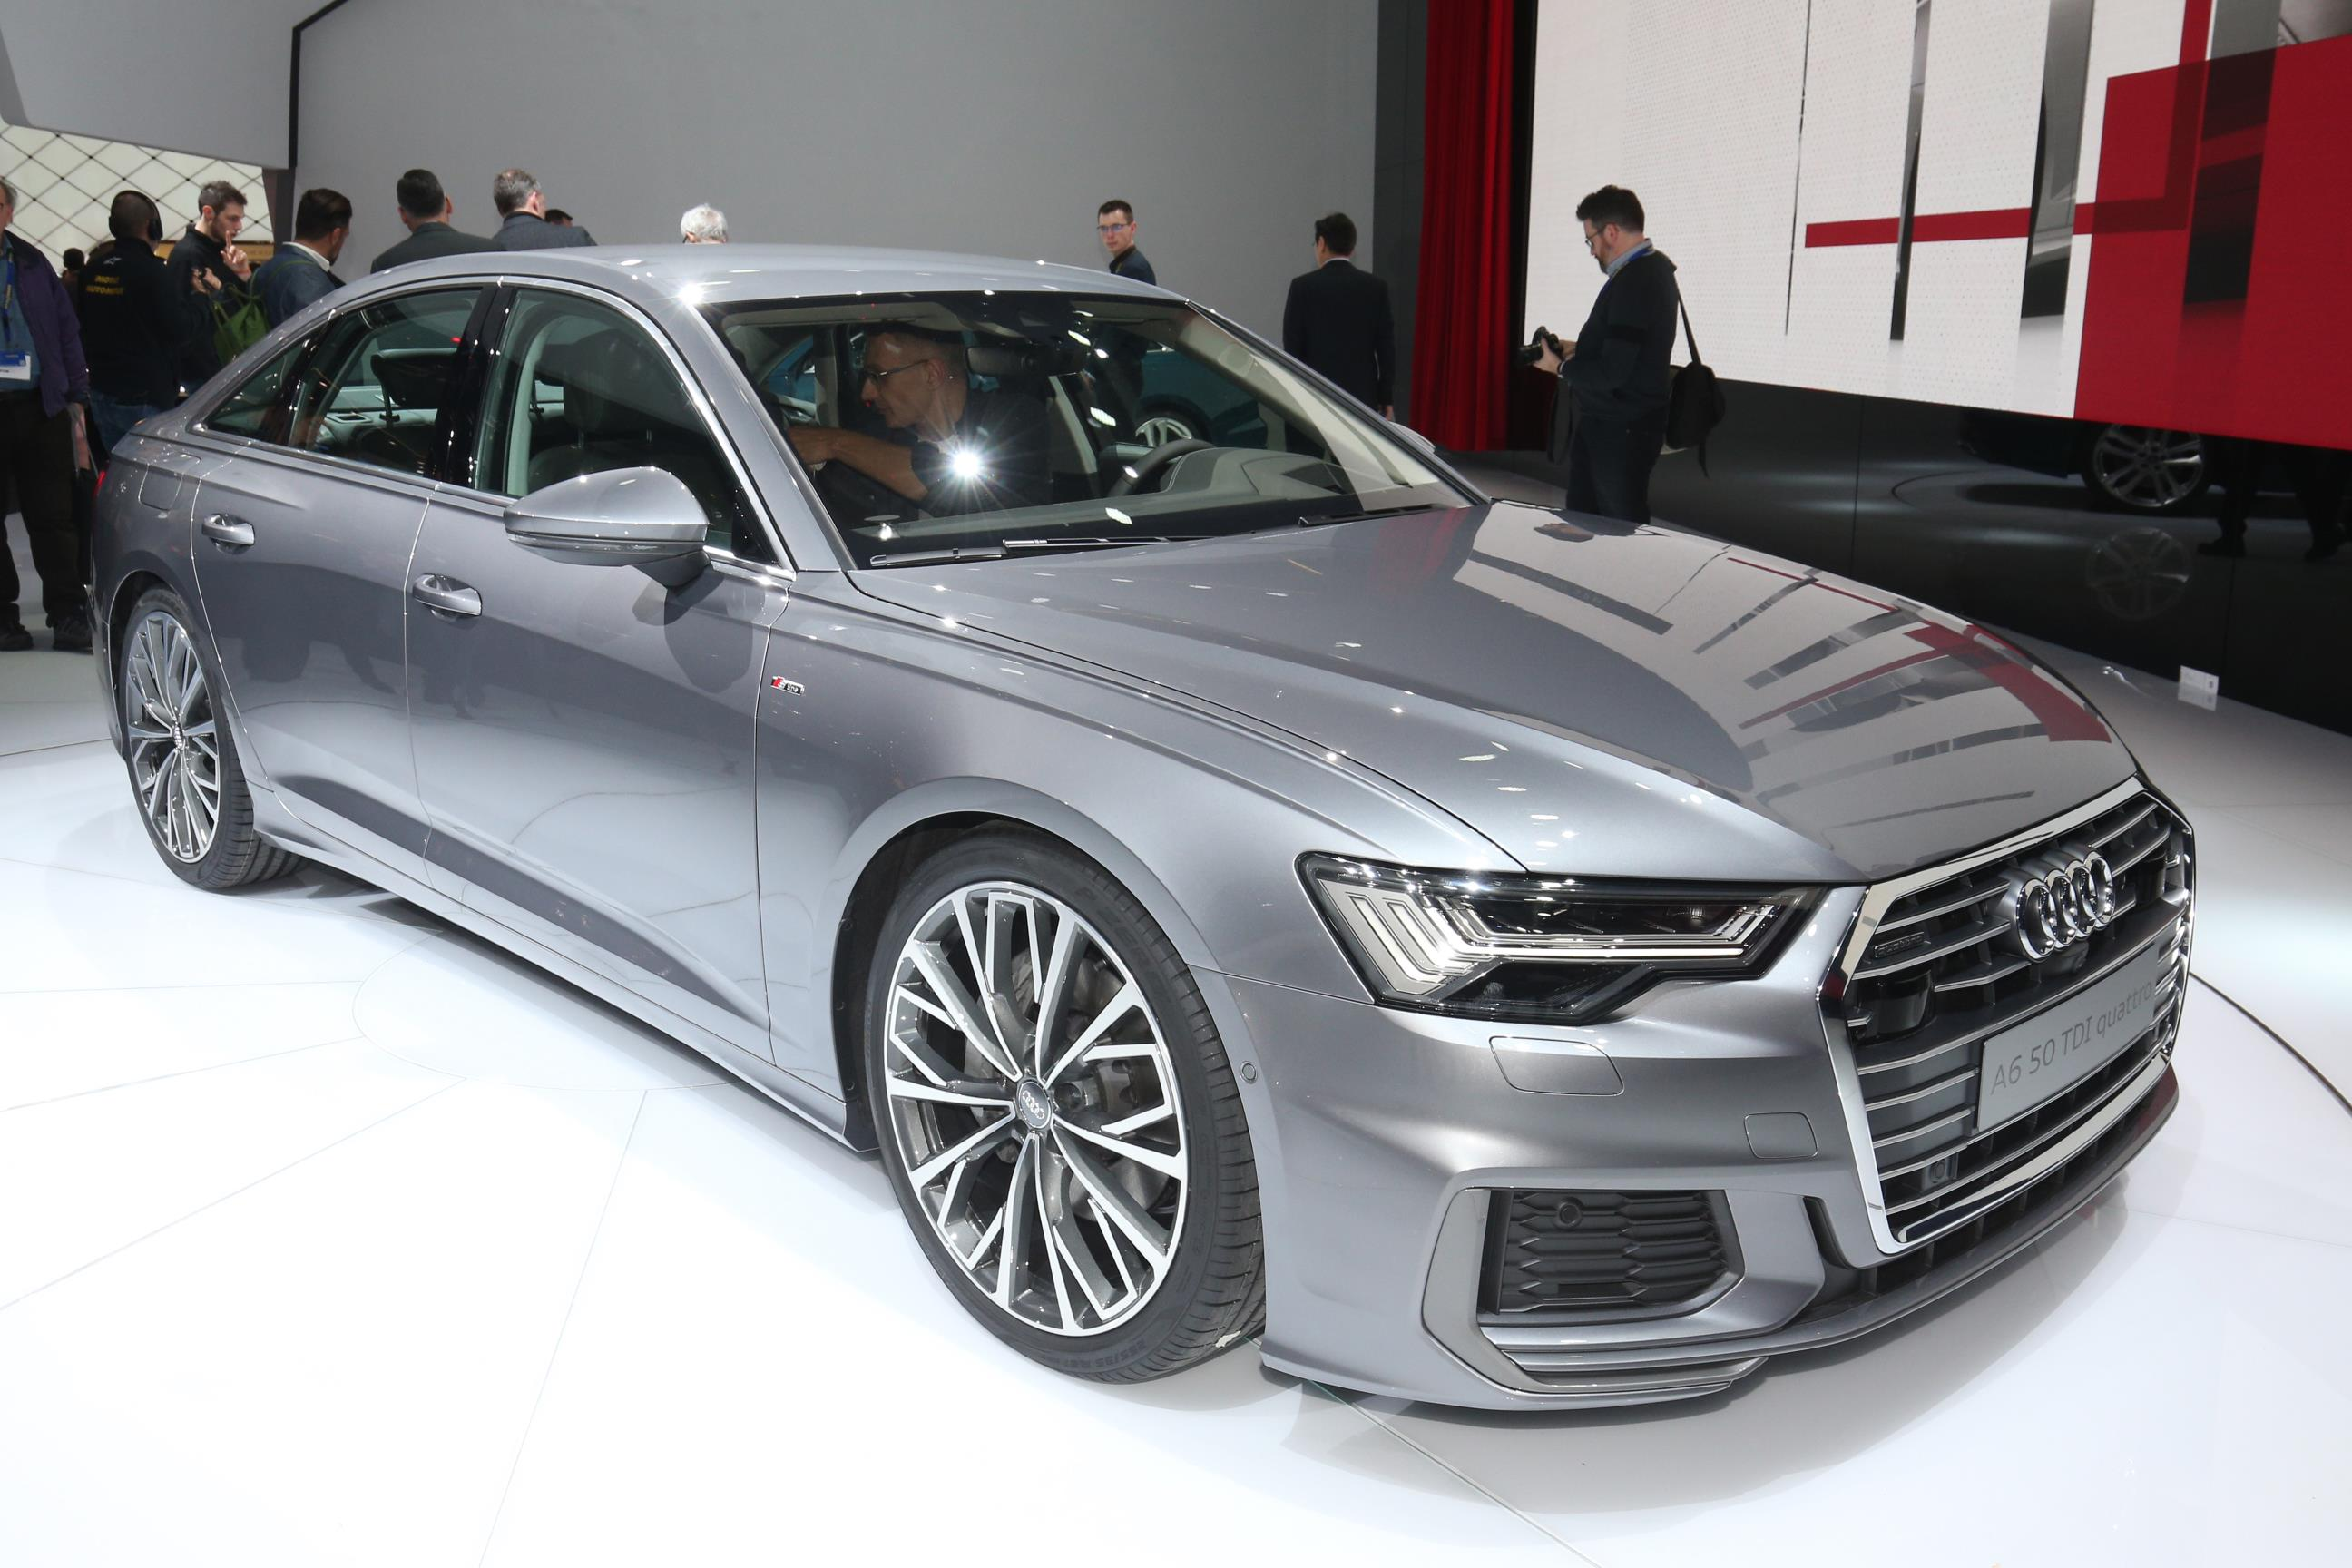 Geneva Motor Show 2018 Mega Gallery Part 1 (392)